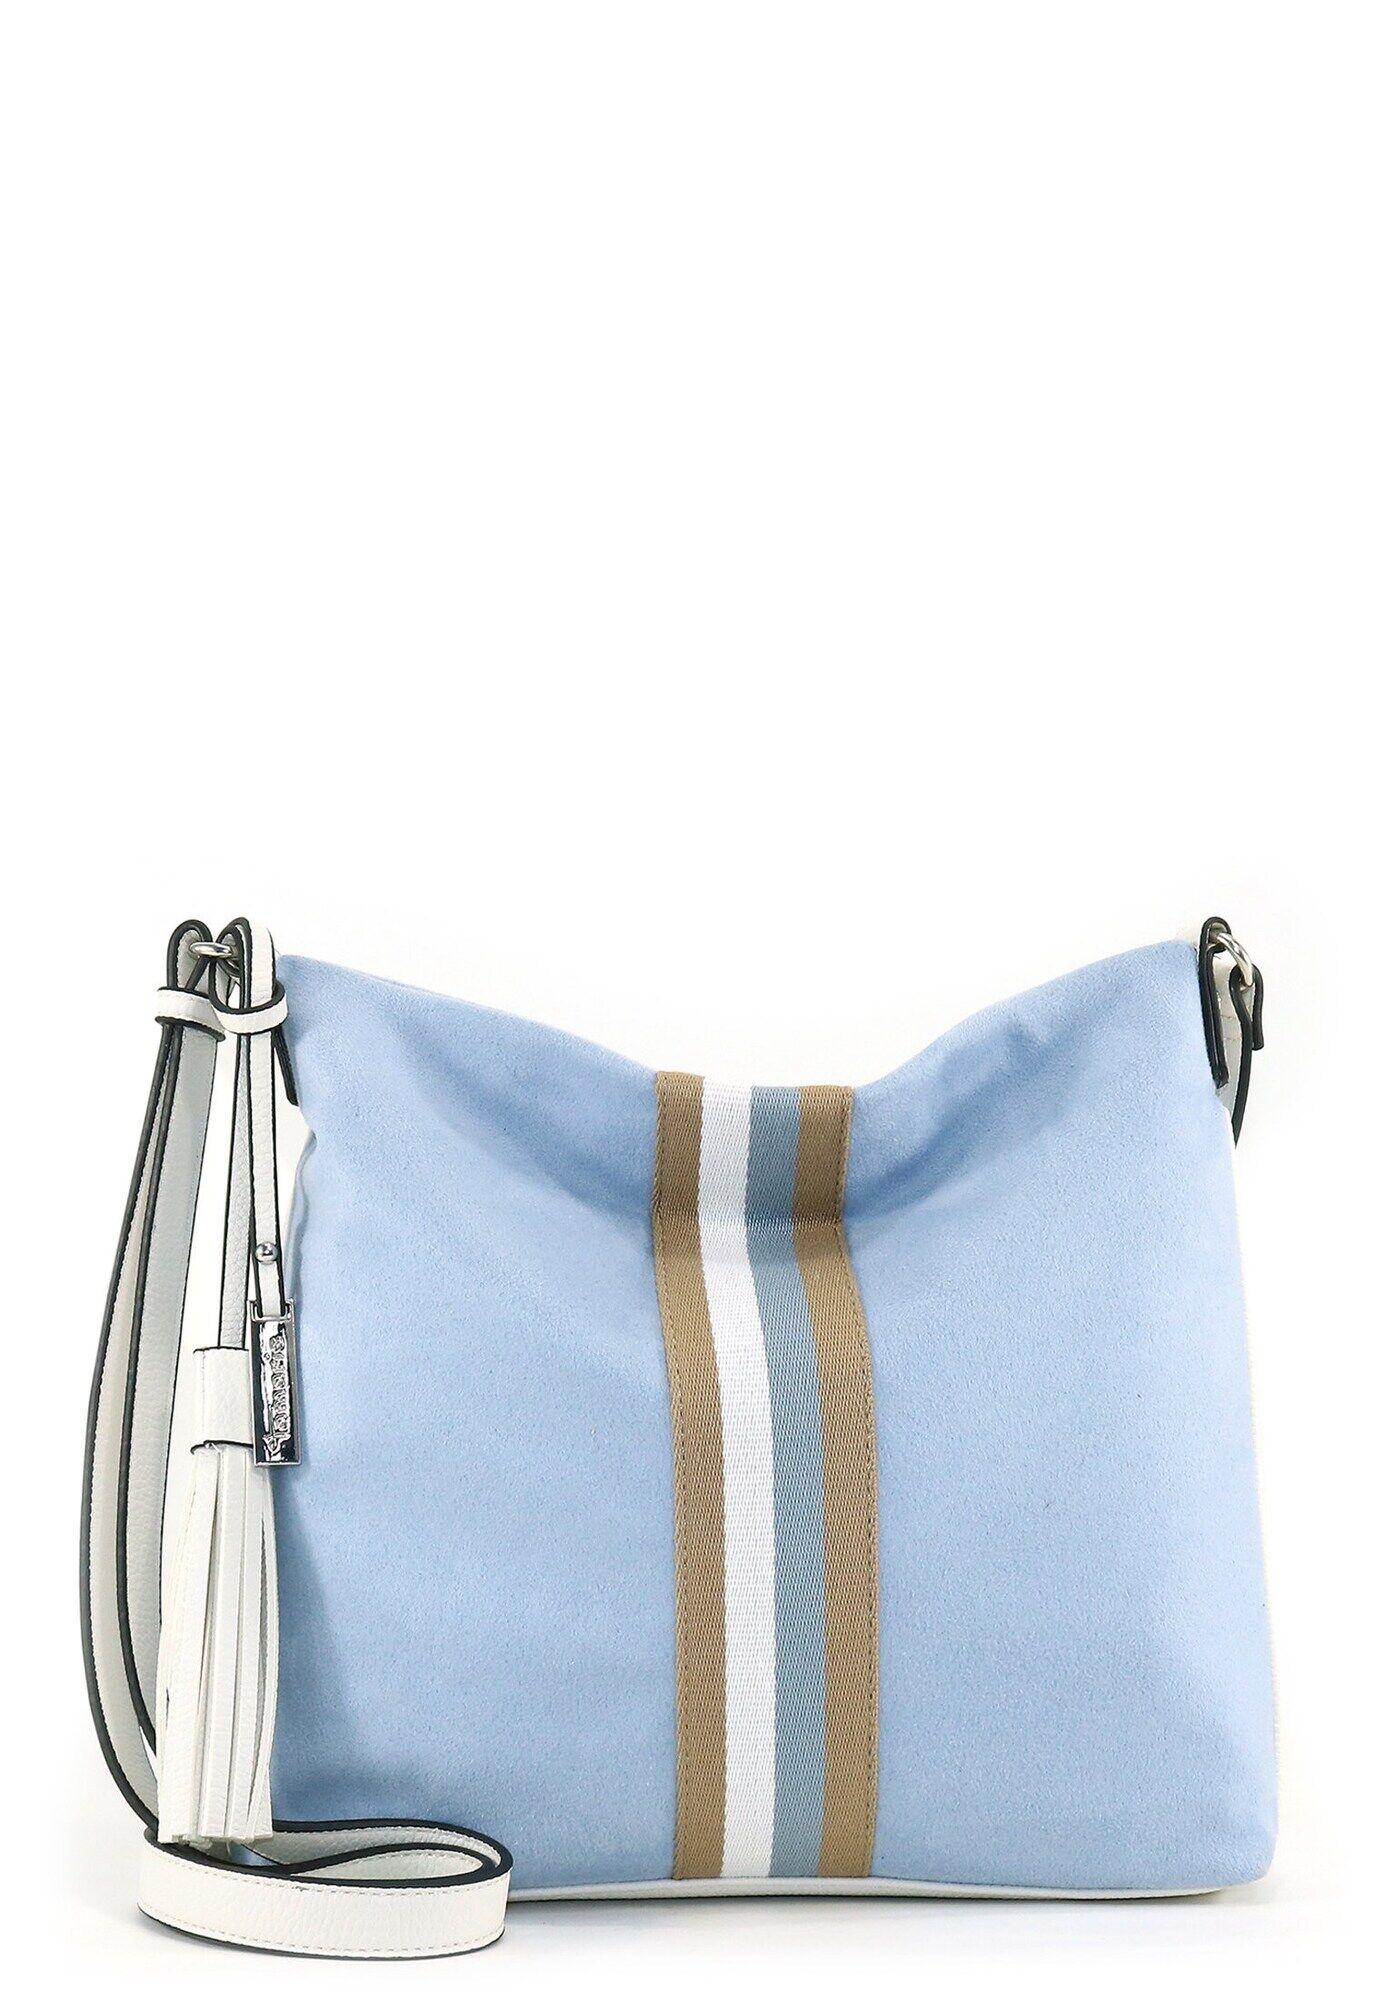 TAMARIS Sac bandoulière  - Bleu - Taille: One Size - female